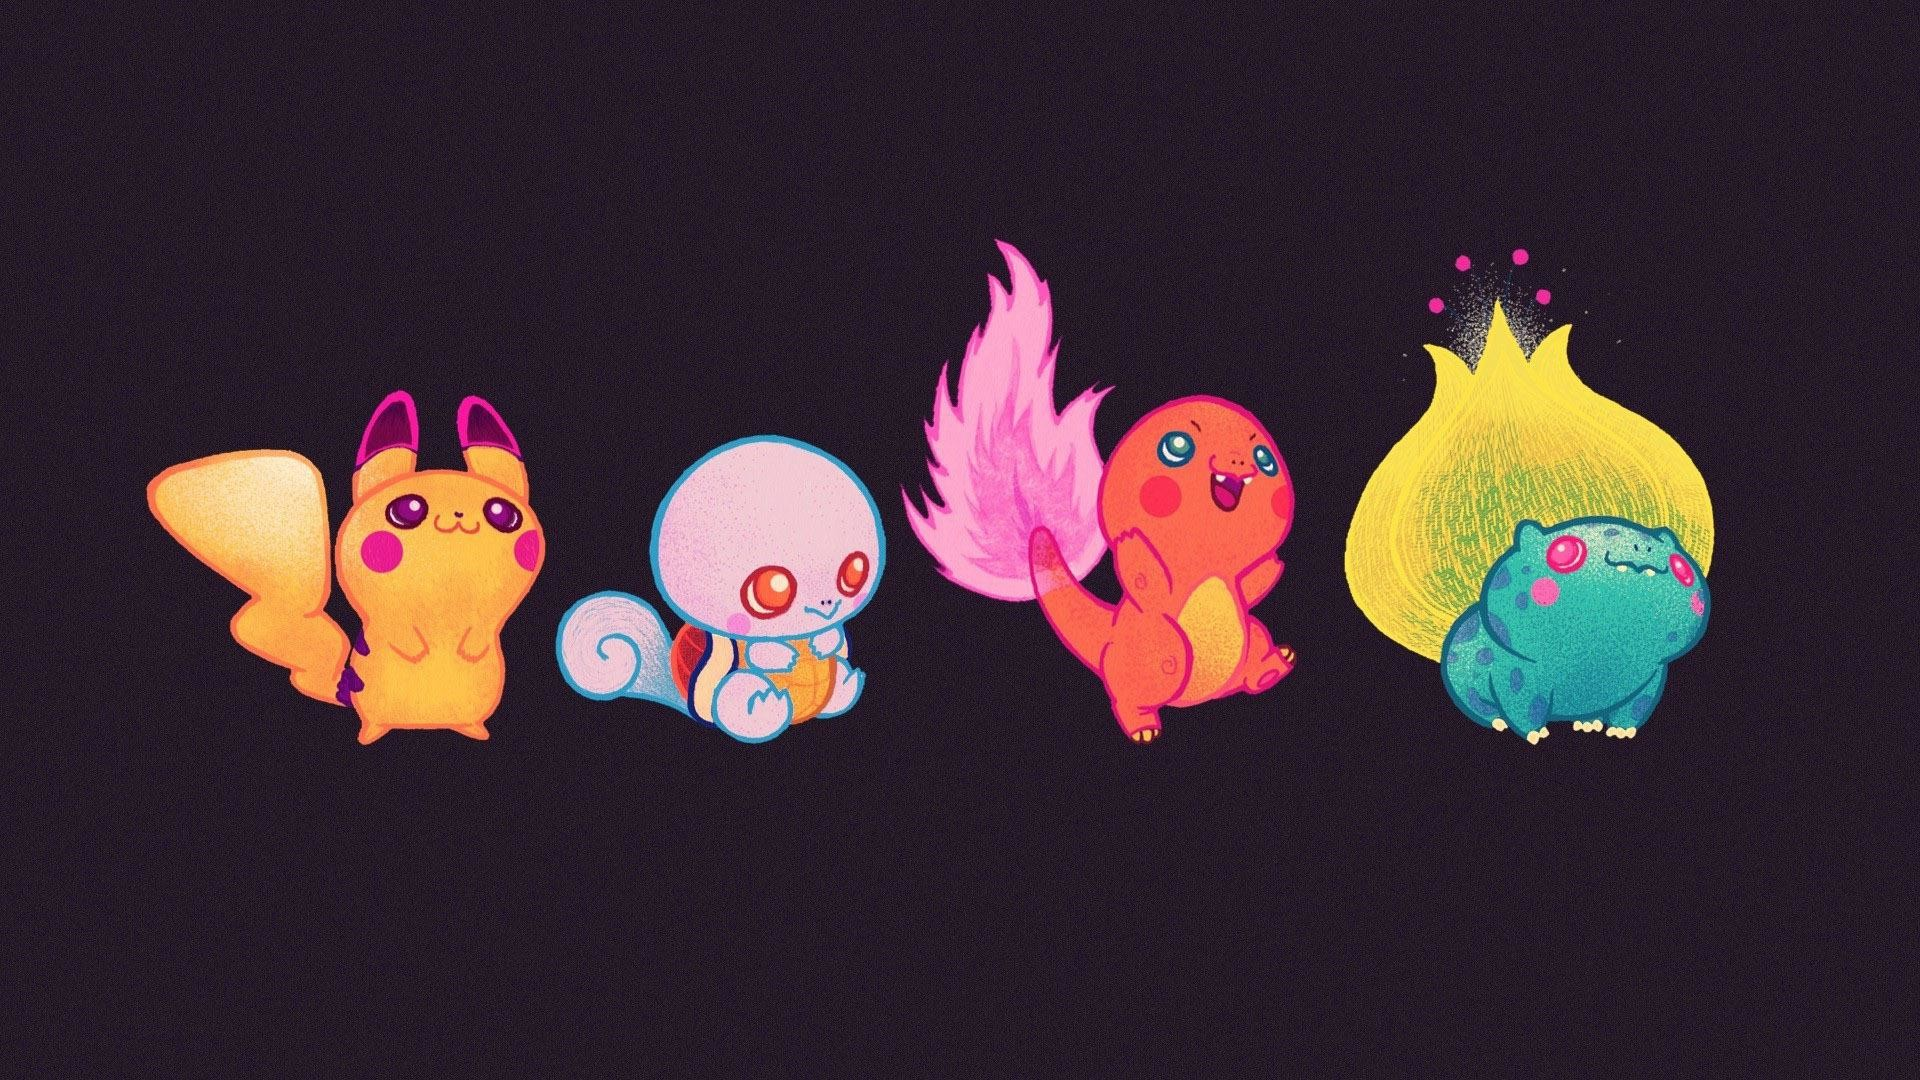 Cute baby Pokemon wallpaper thumb